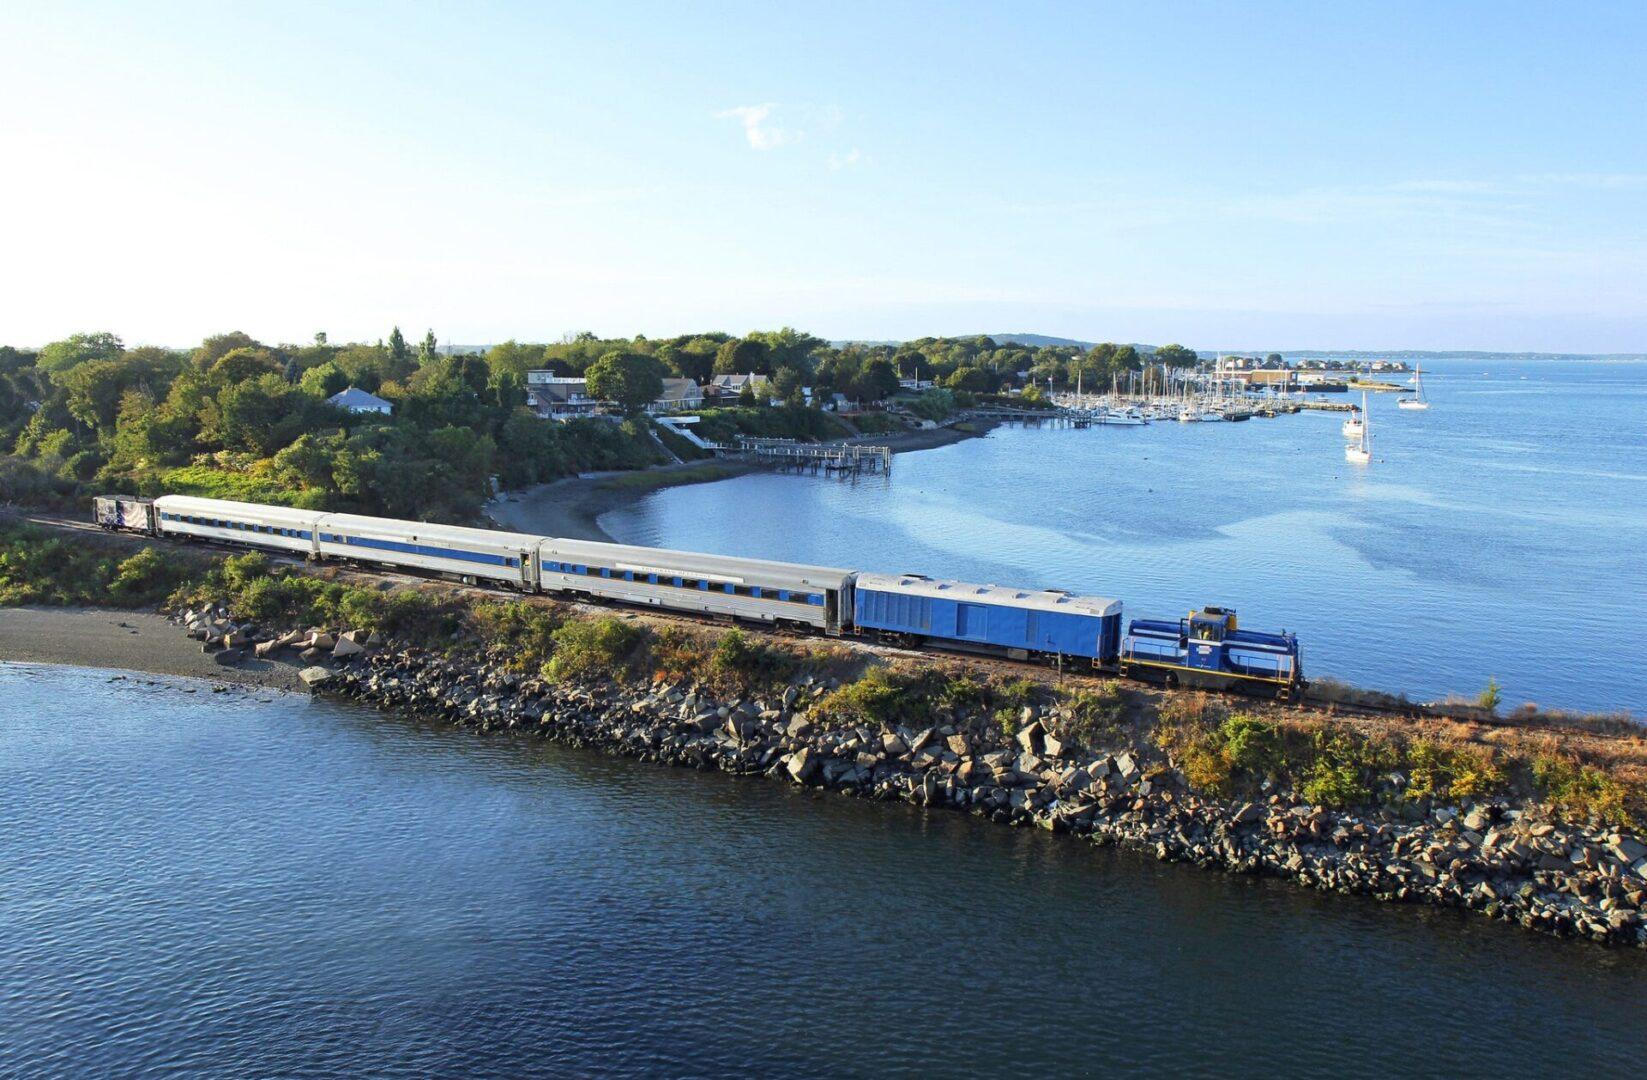 Grand Bellevue train at the Causeway in Rhode Island